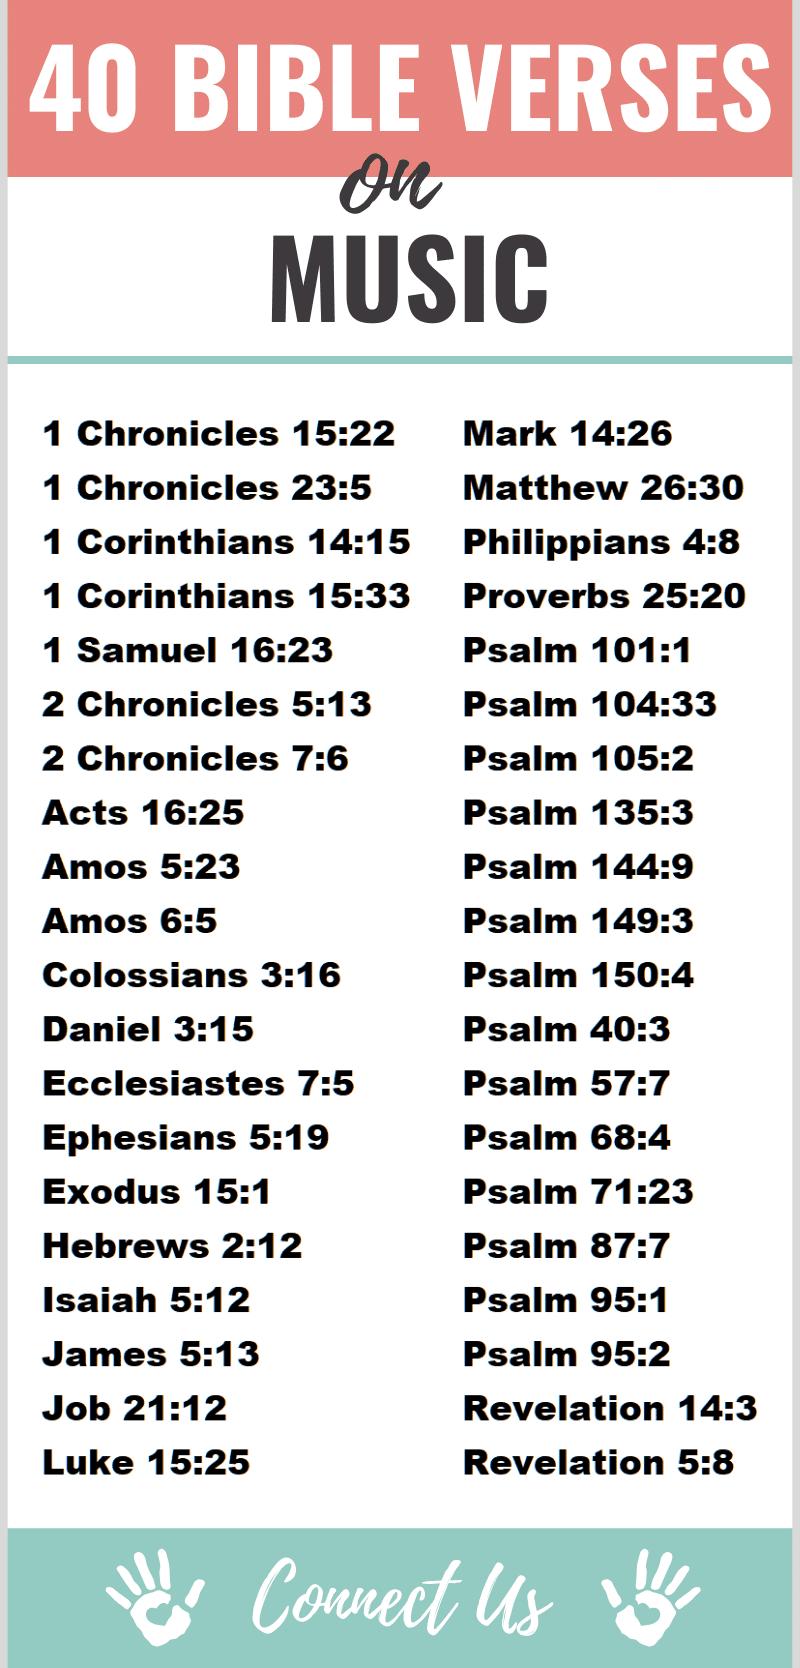 Bible Verses on Music